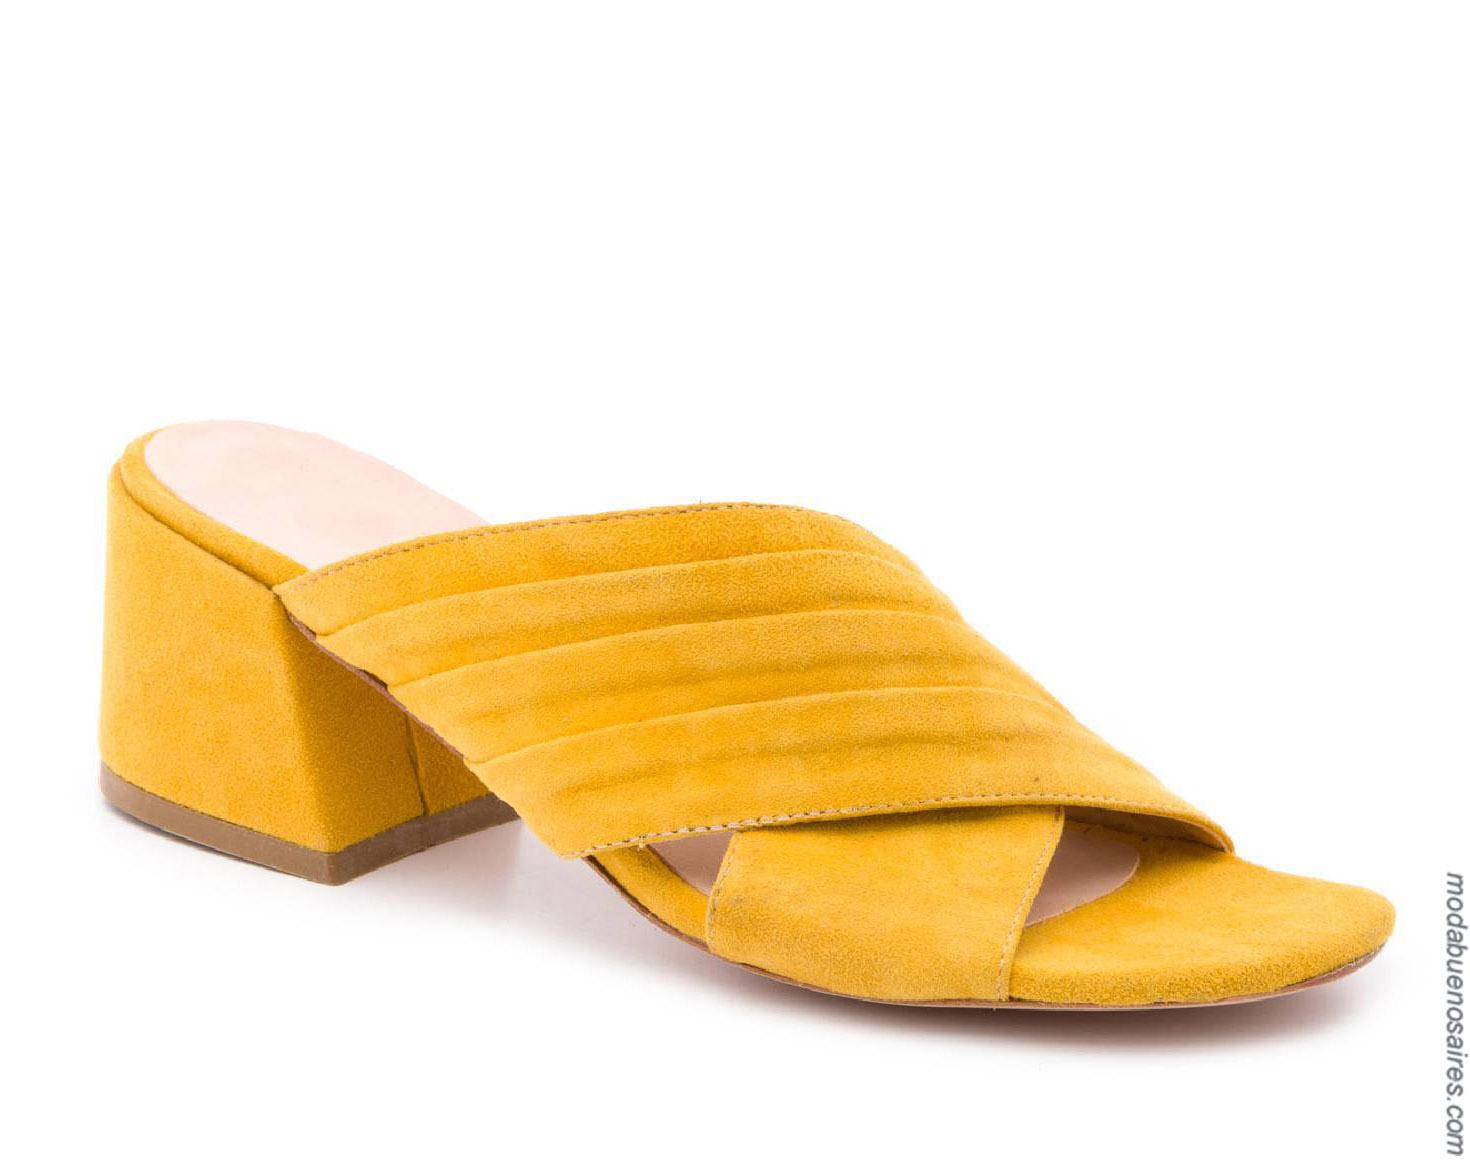 Moda sandalias primavera verano 2020. Moda mujer primavera verano 2020.